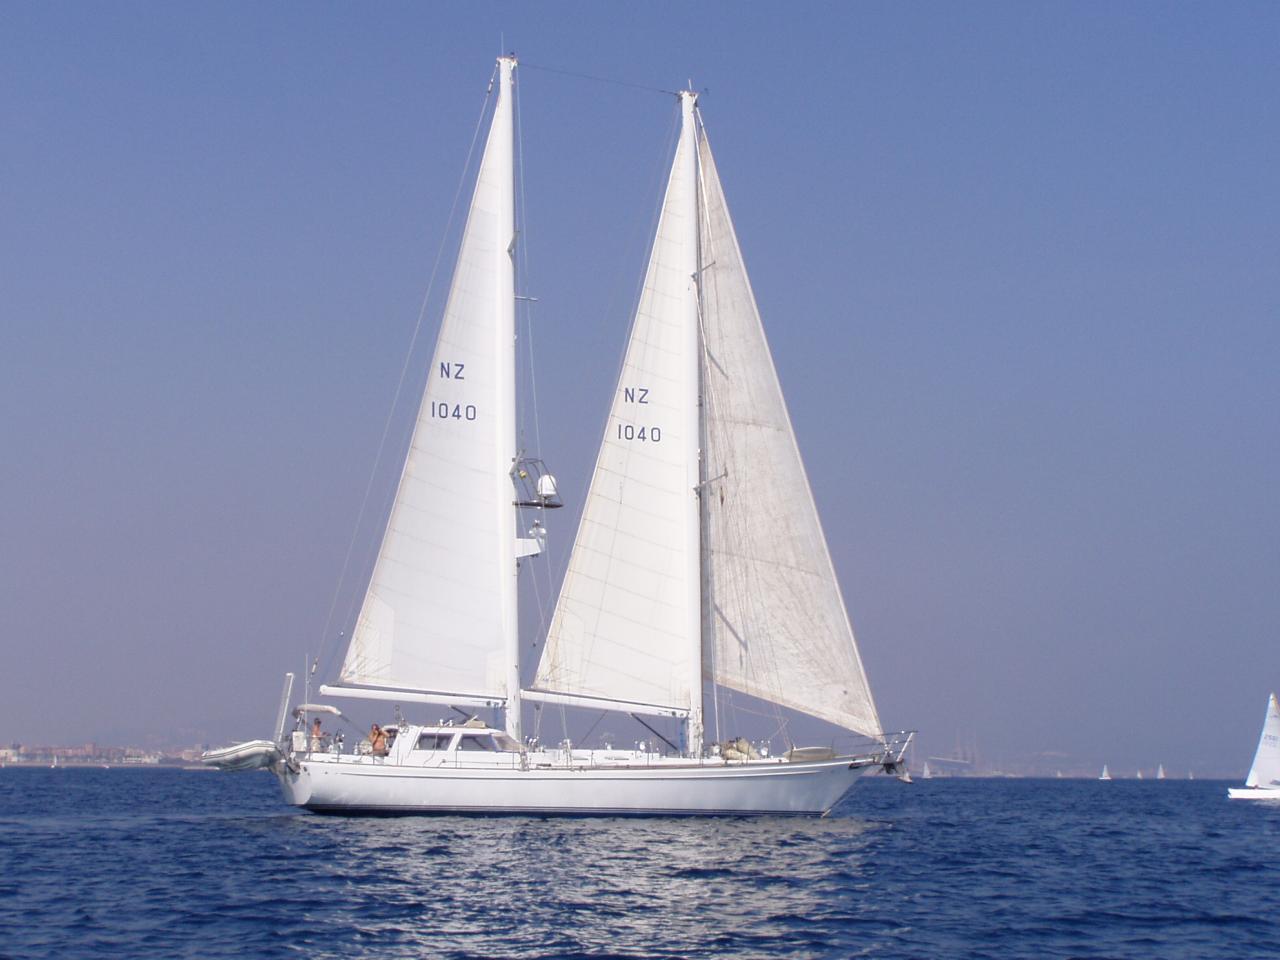 Sir Peter Blake's boat Archangel